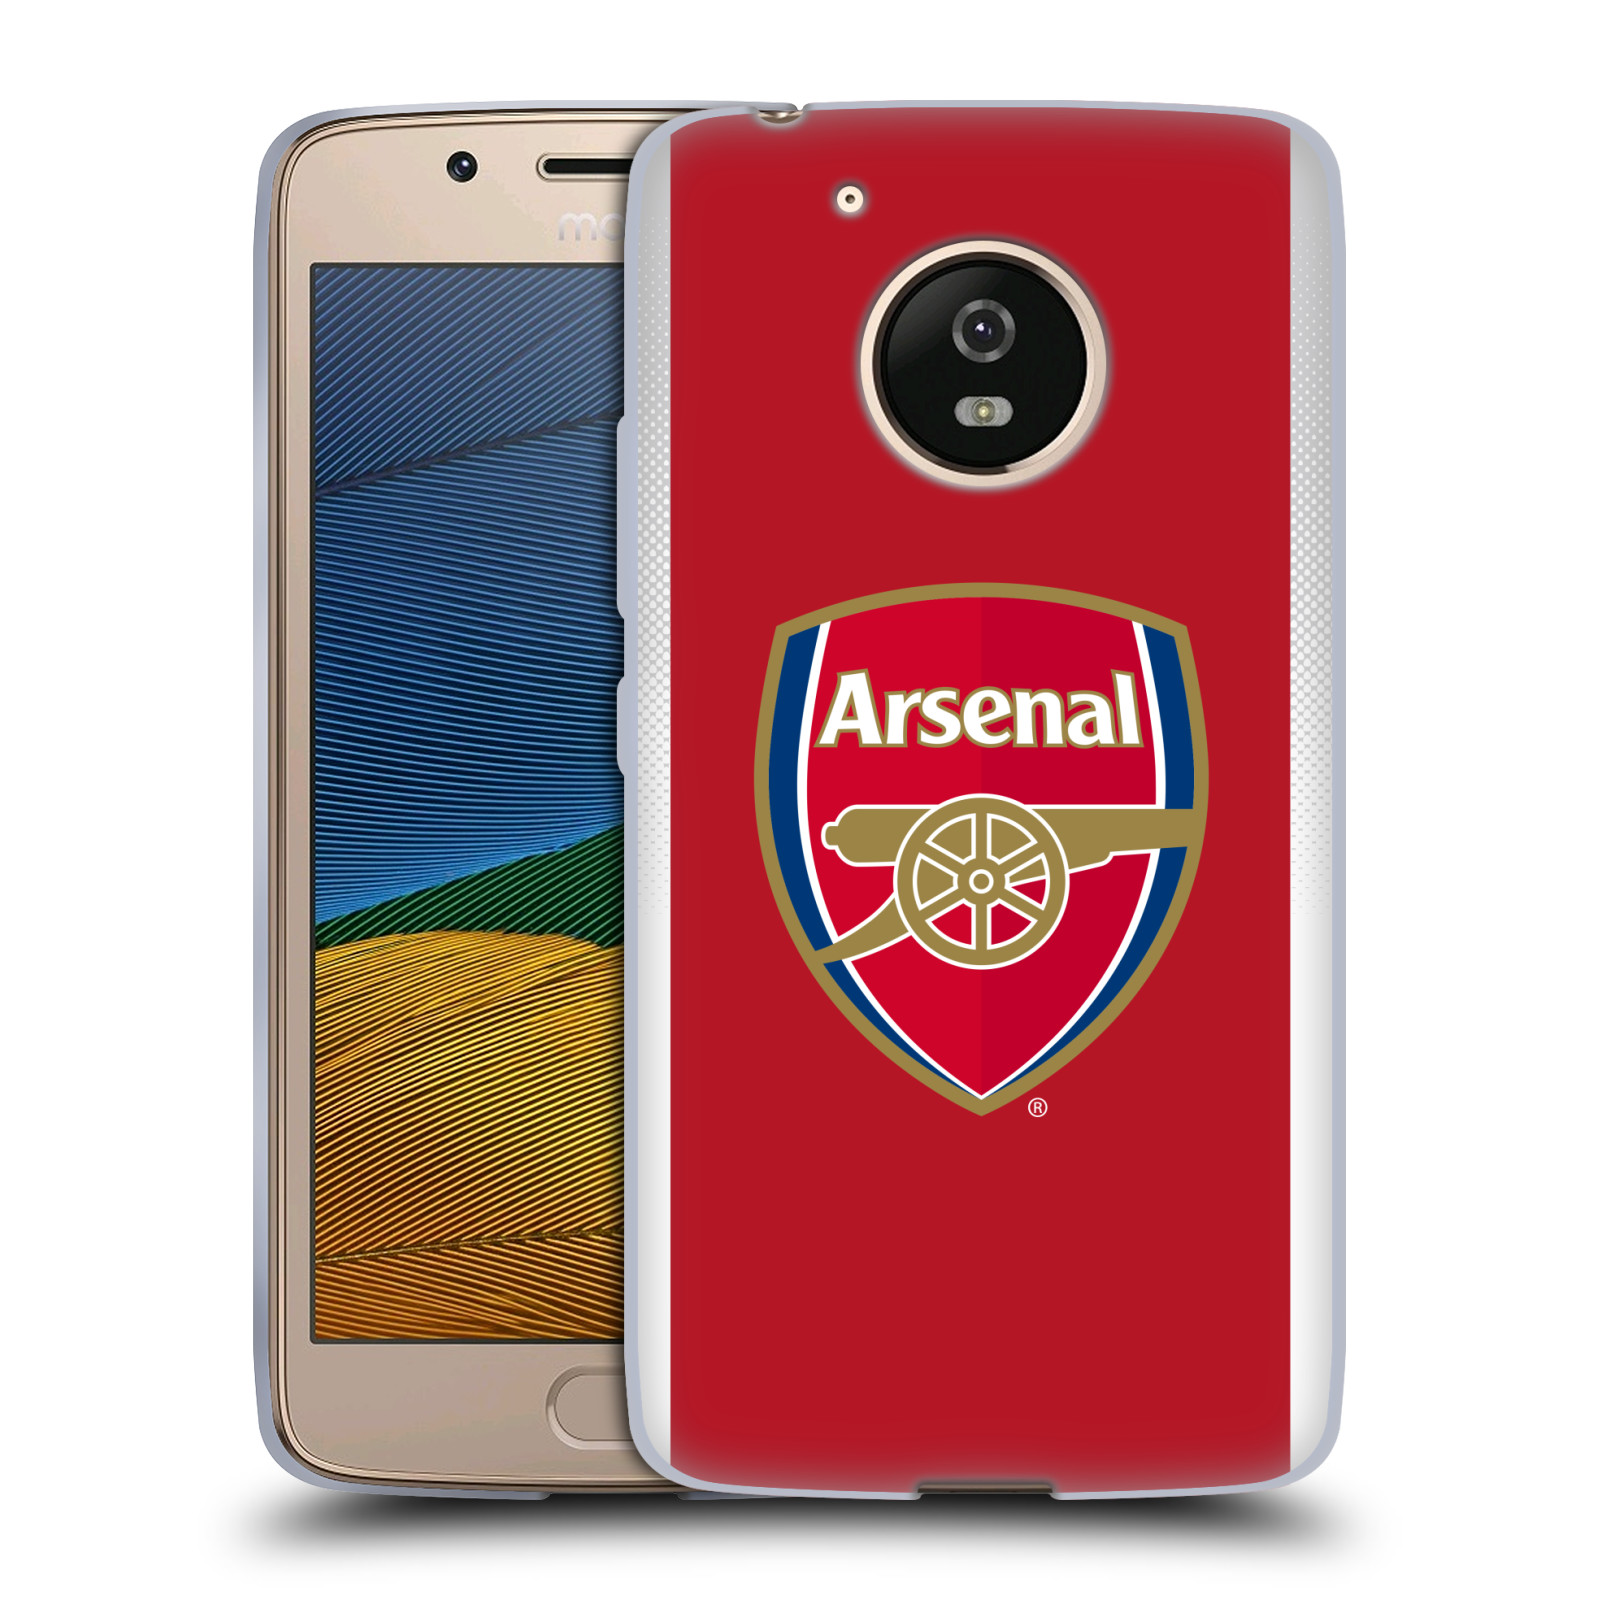 Silikonové pouzdro na mobil Lenovo Moto G5 - Head Case - Arsenal FC - Logo klubu